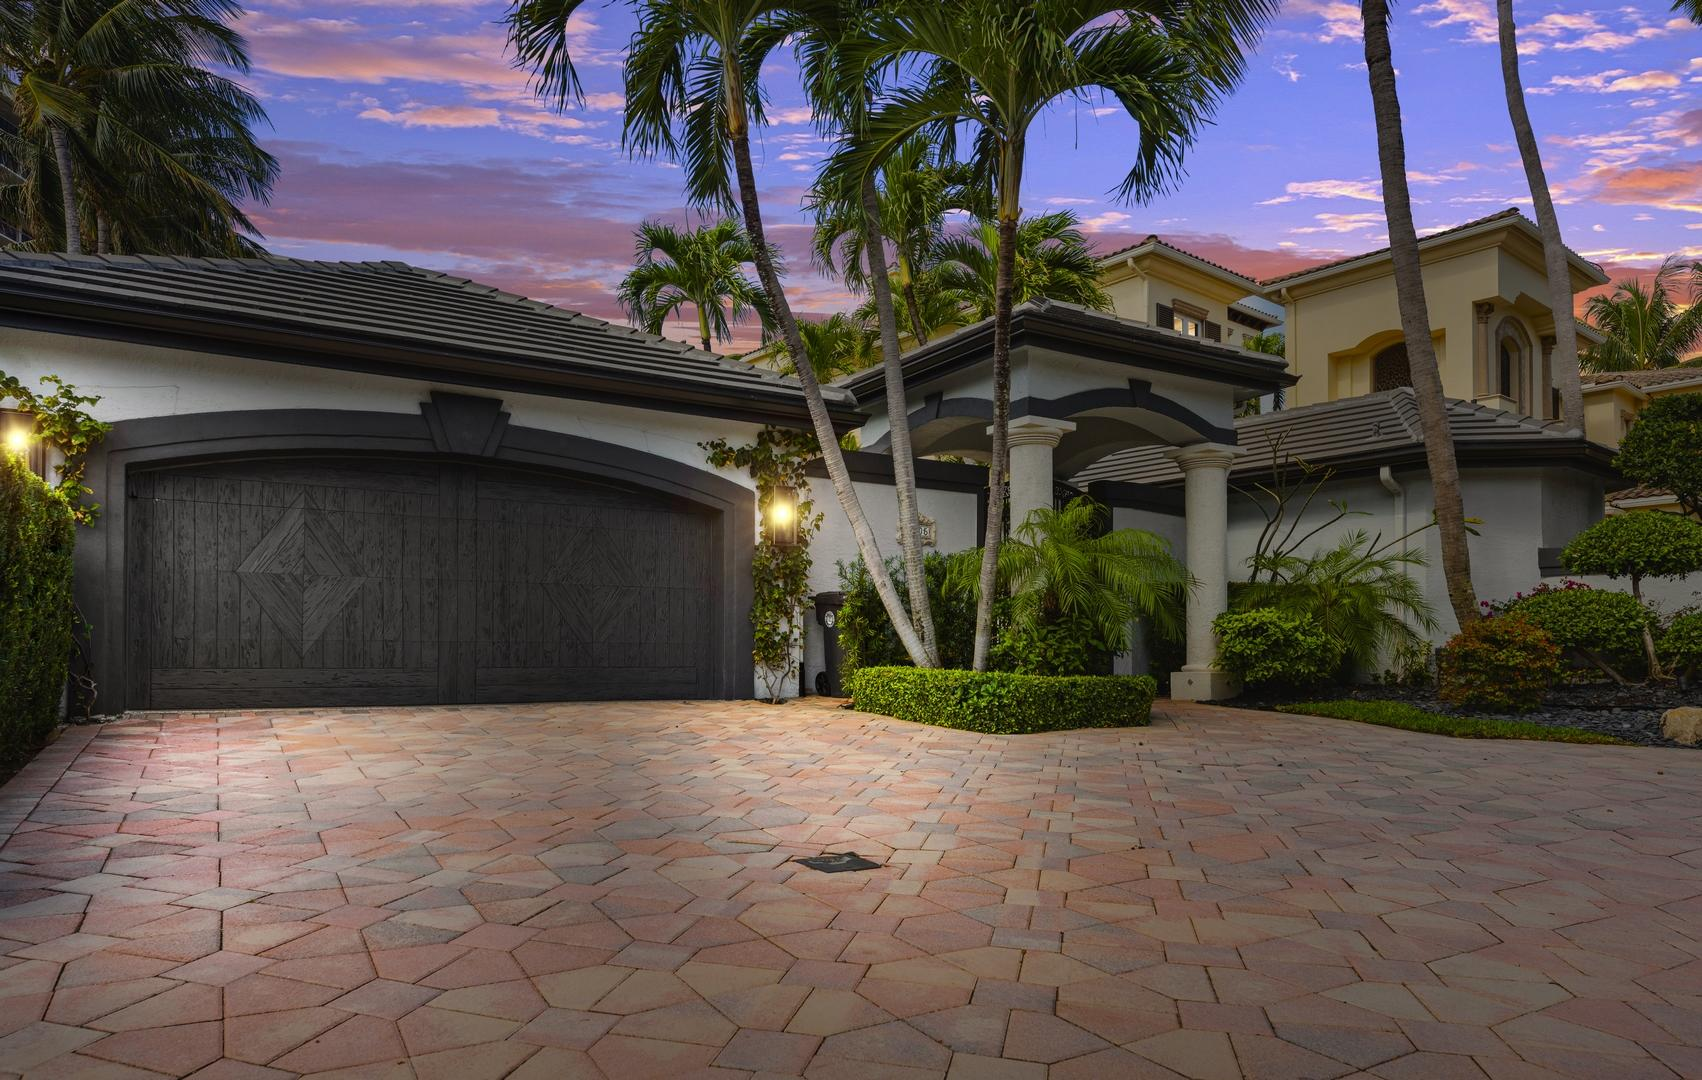 Photo of 1005 Grand Court, Highland Beach, FL 33487